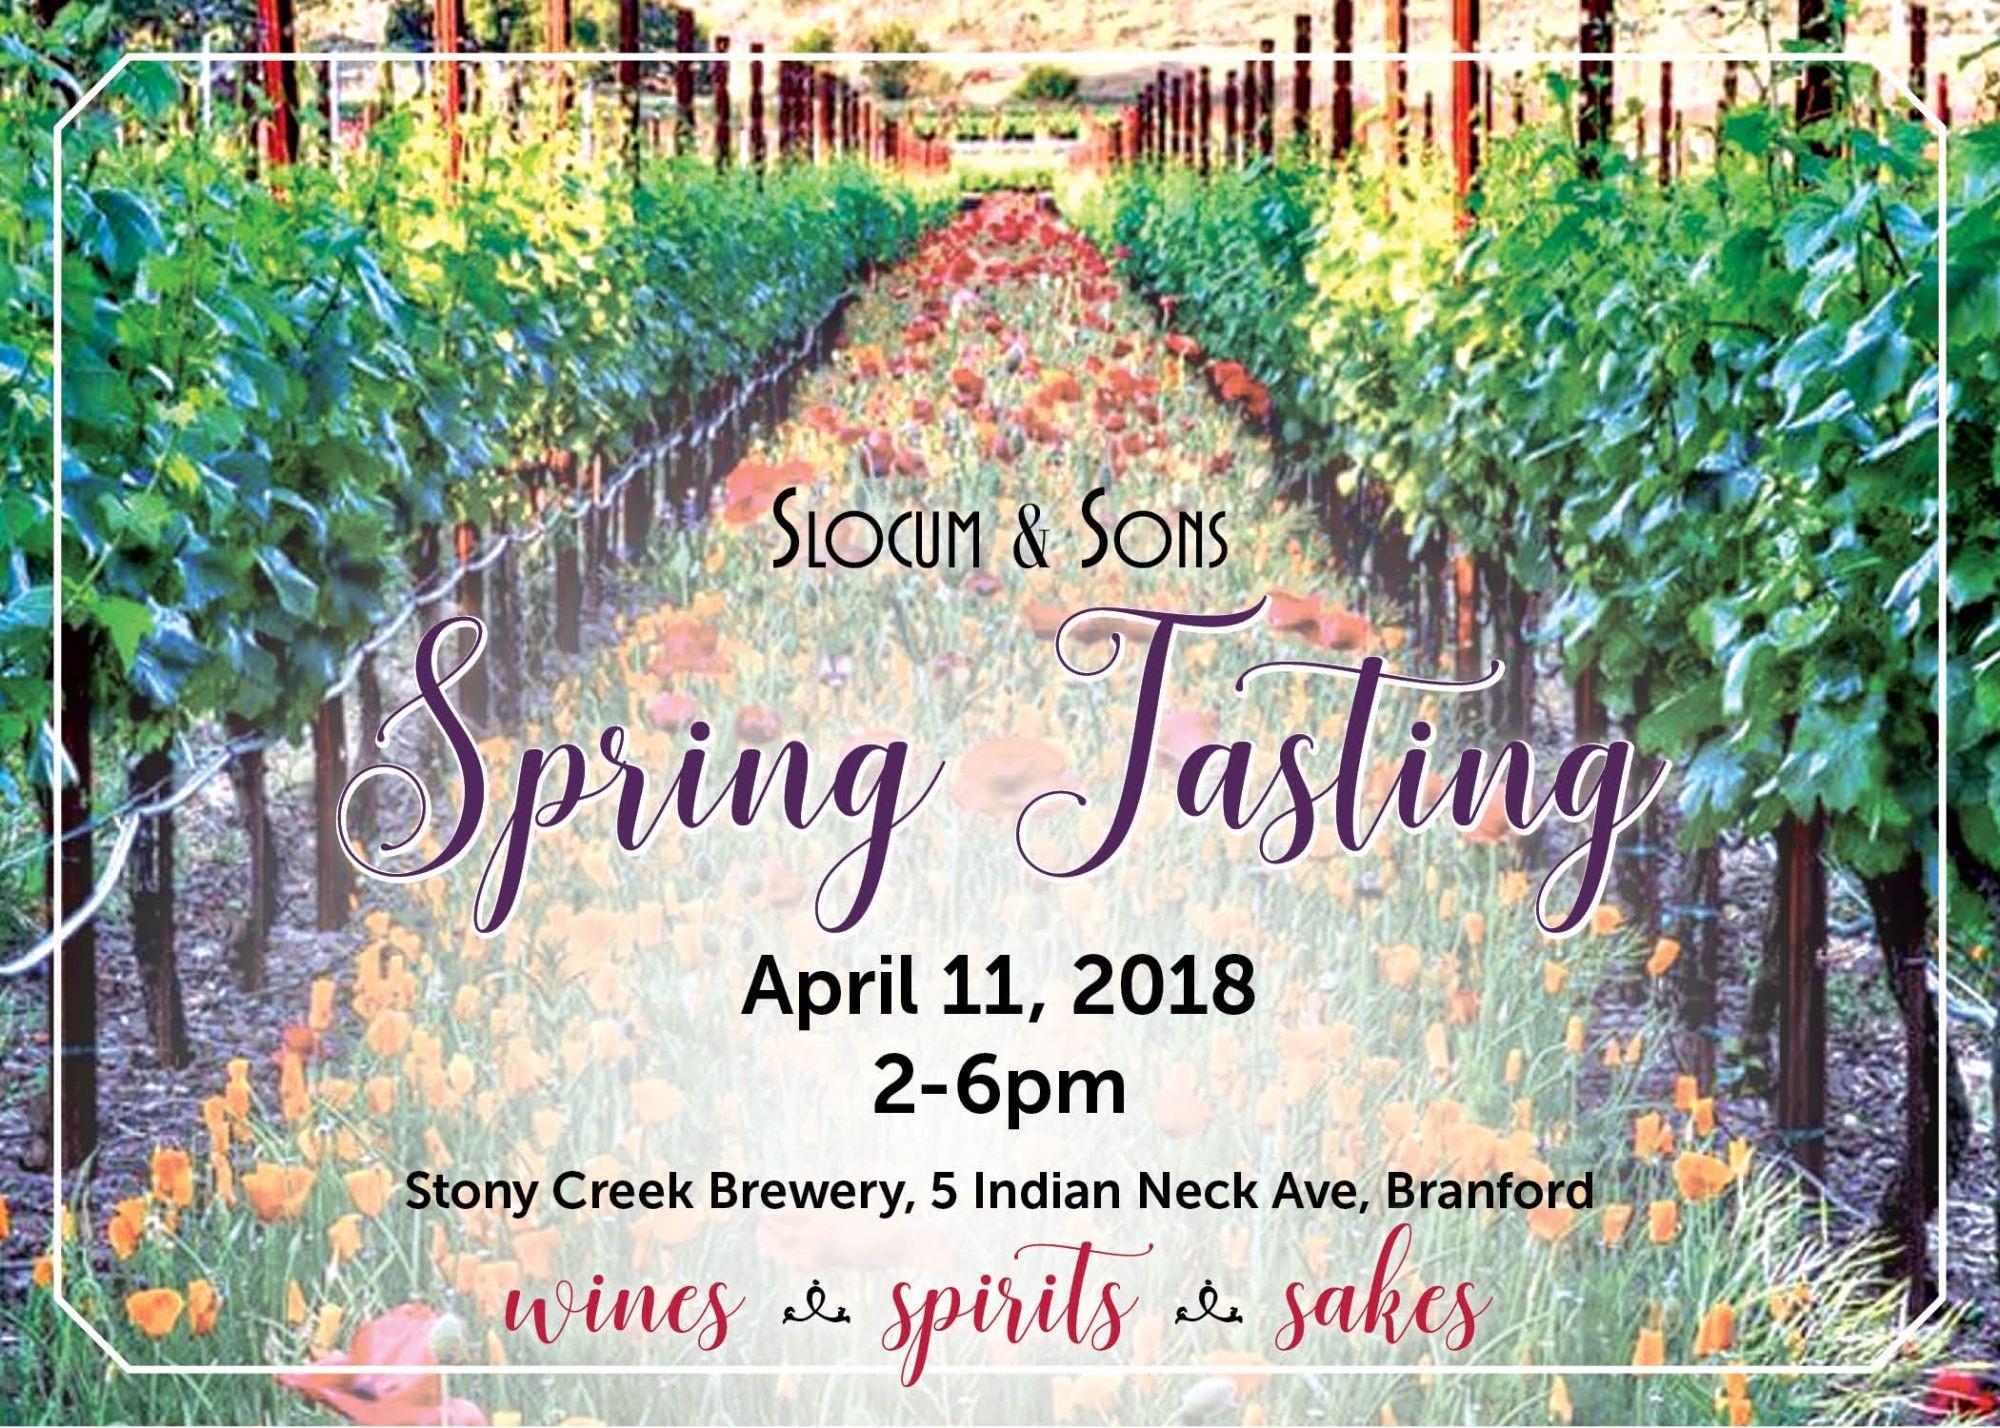 April 11, 2018: Slocum & Sons Spring Tasting (Trade Only)